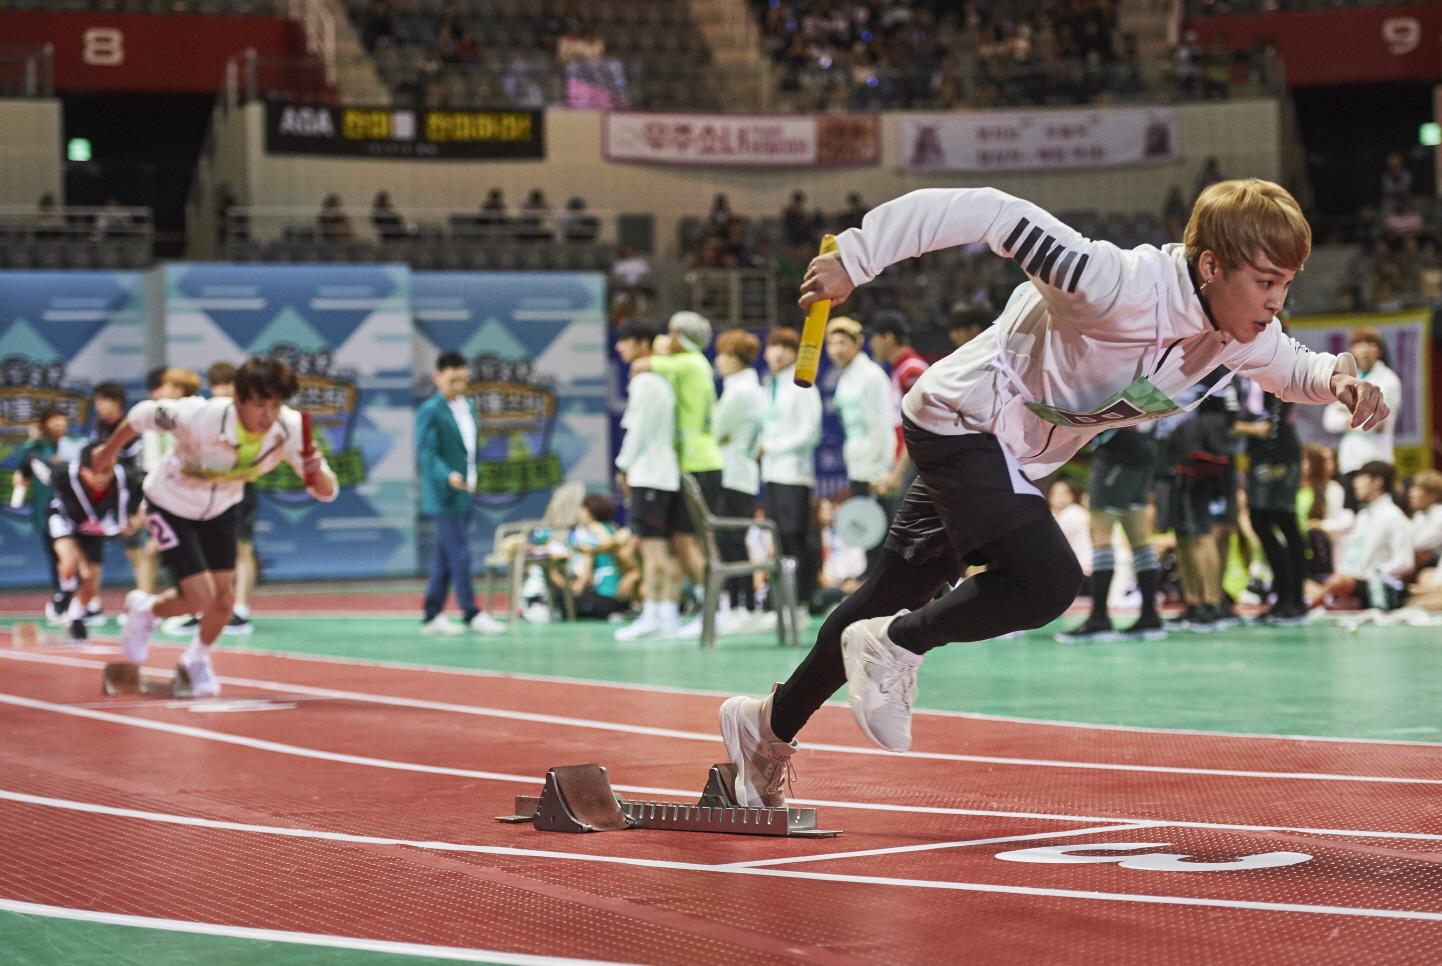 BTS Jimin 2016 ISAC chuseok